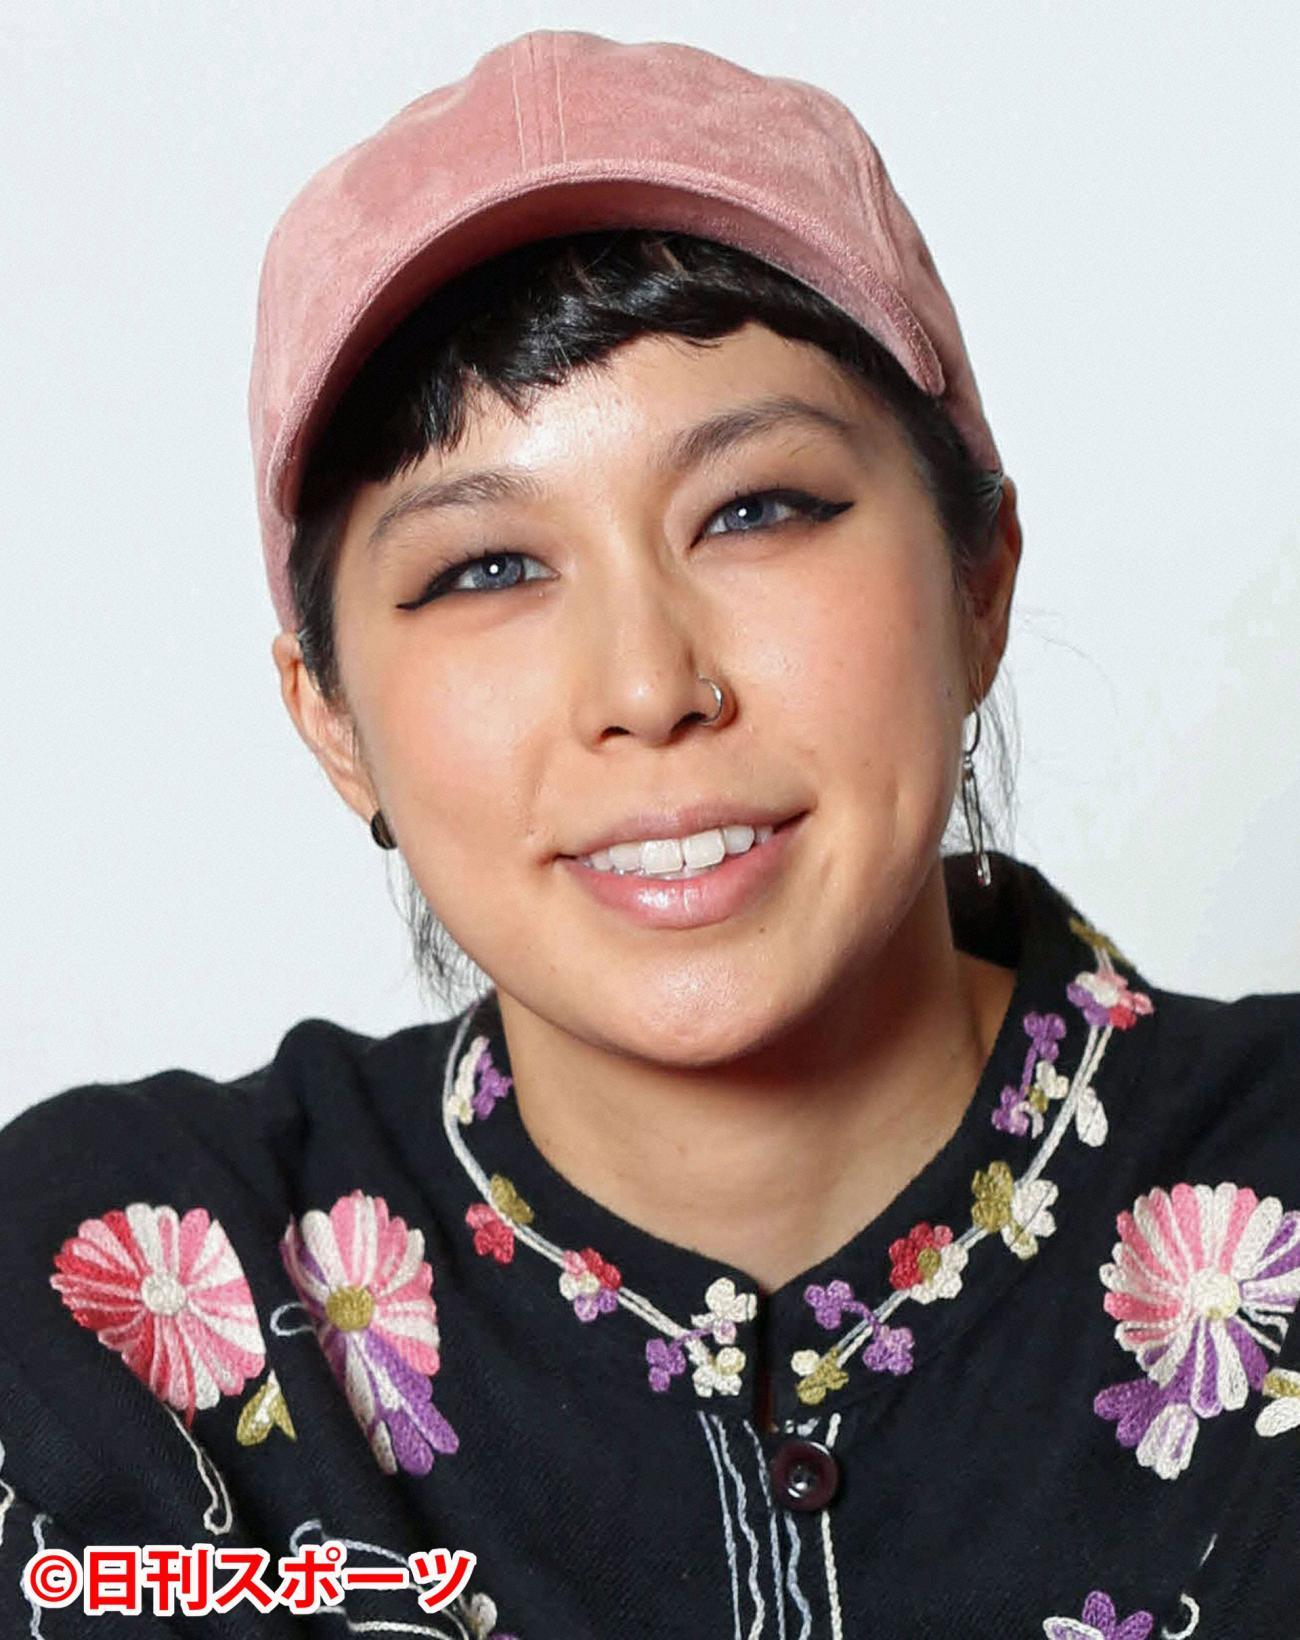 AI武道館公演GYAOが独占生配信 新曲歌唱も - 音楽 : 日刊スポーツ